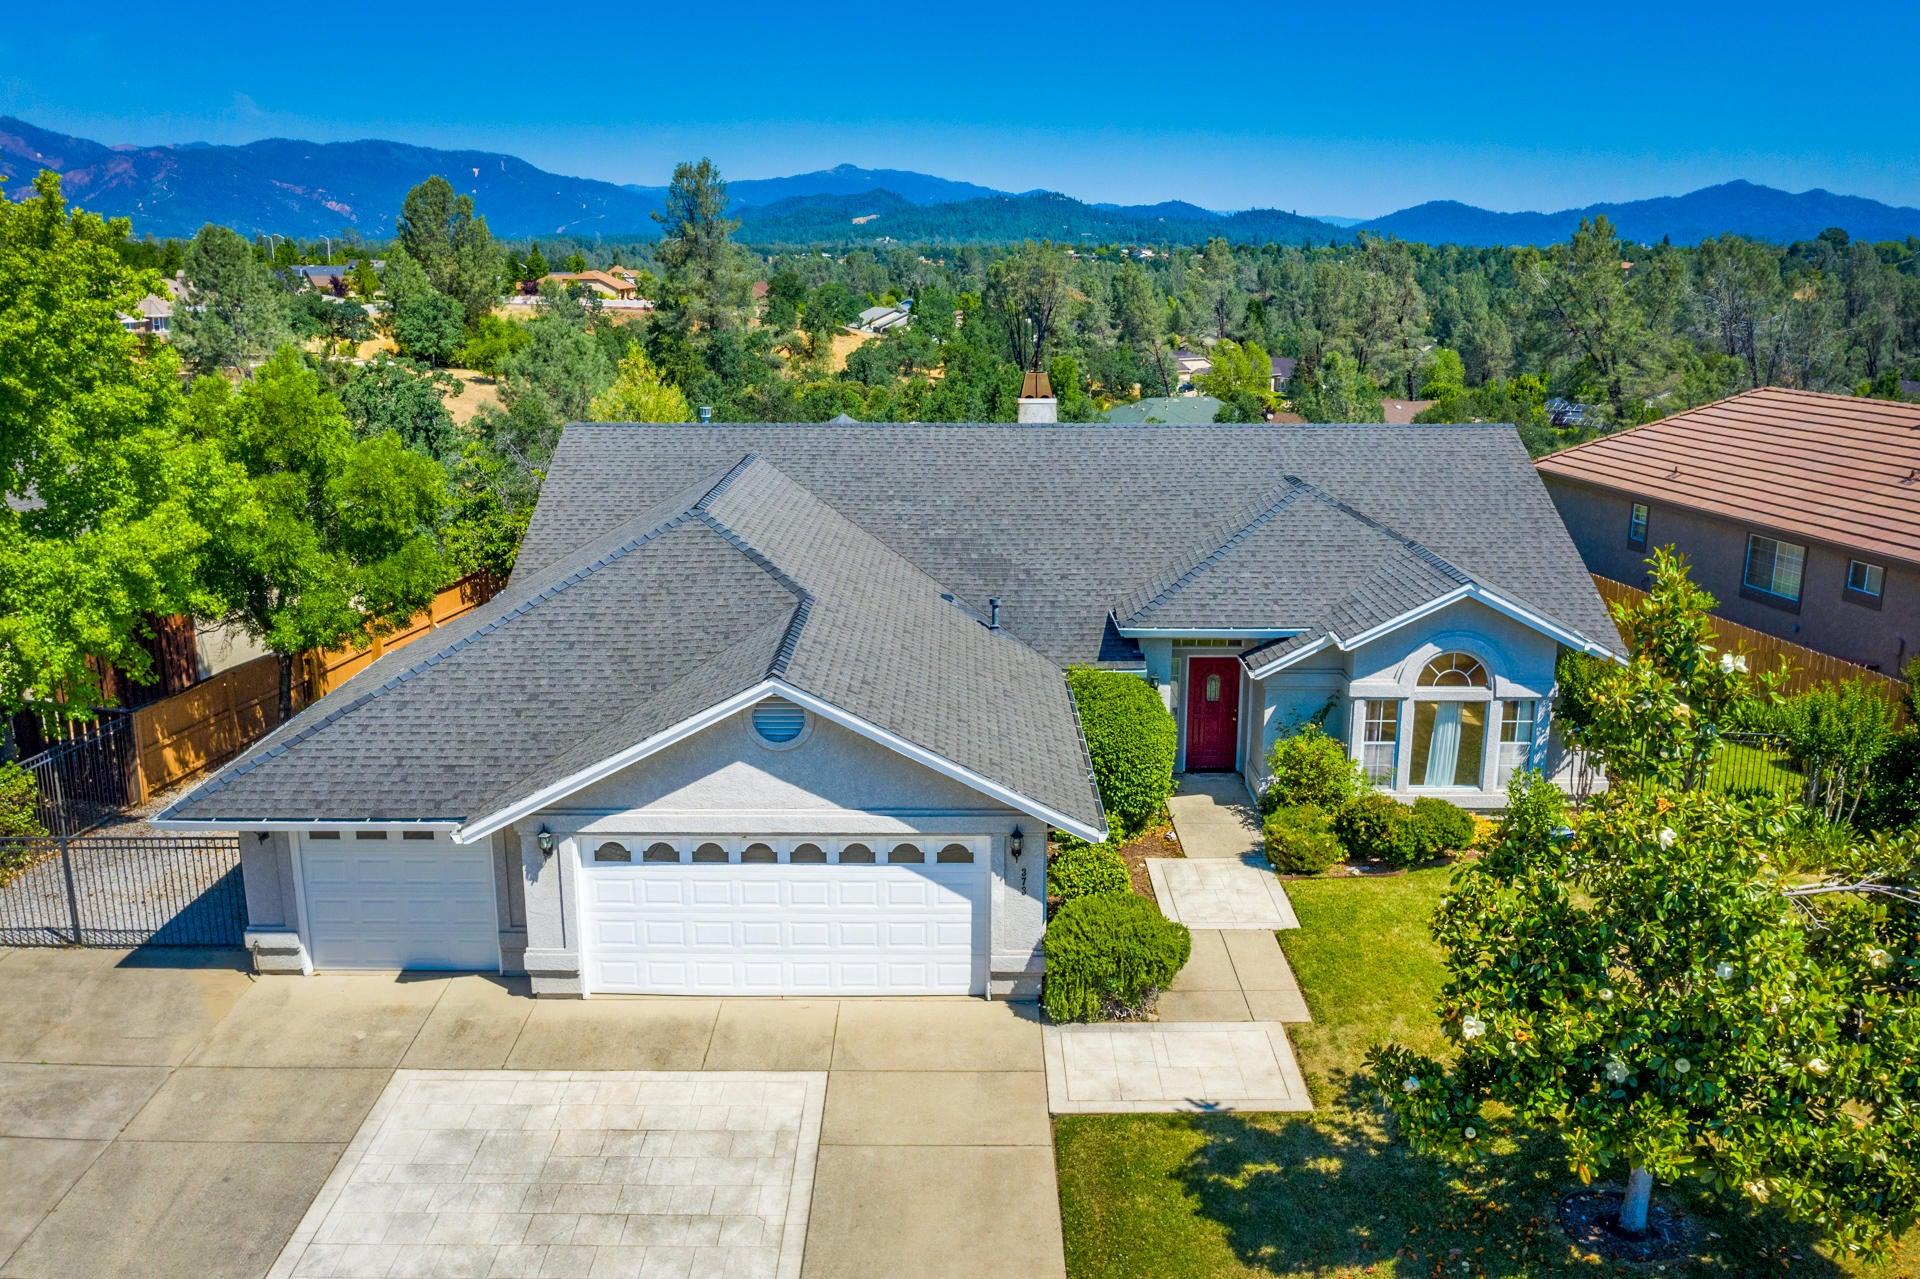 373 River Park Dr, Redding, CA 96003